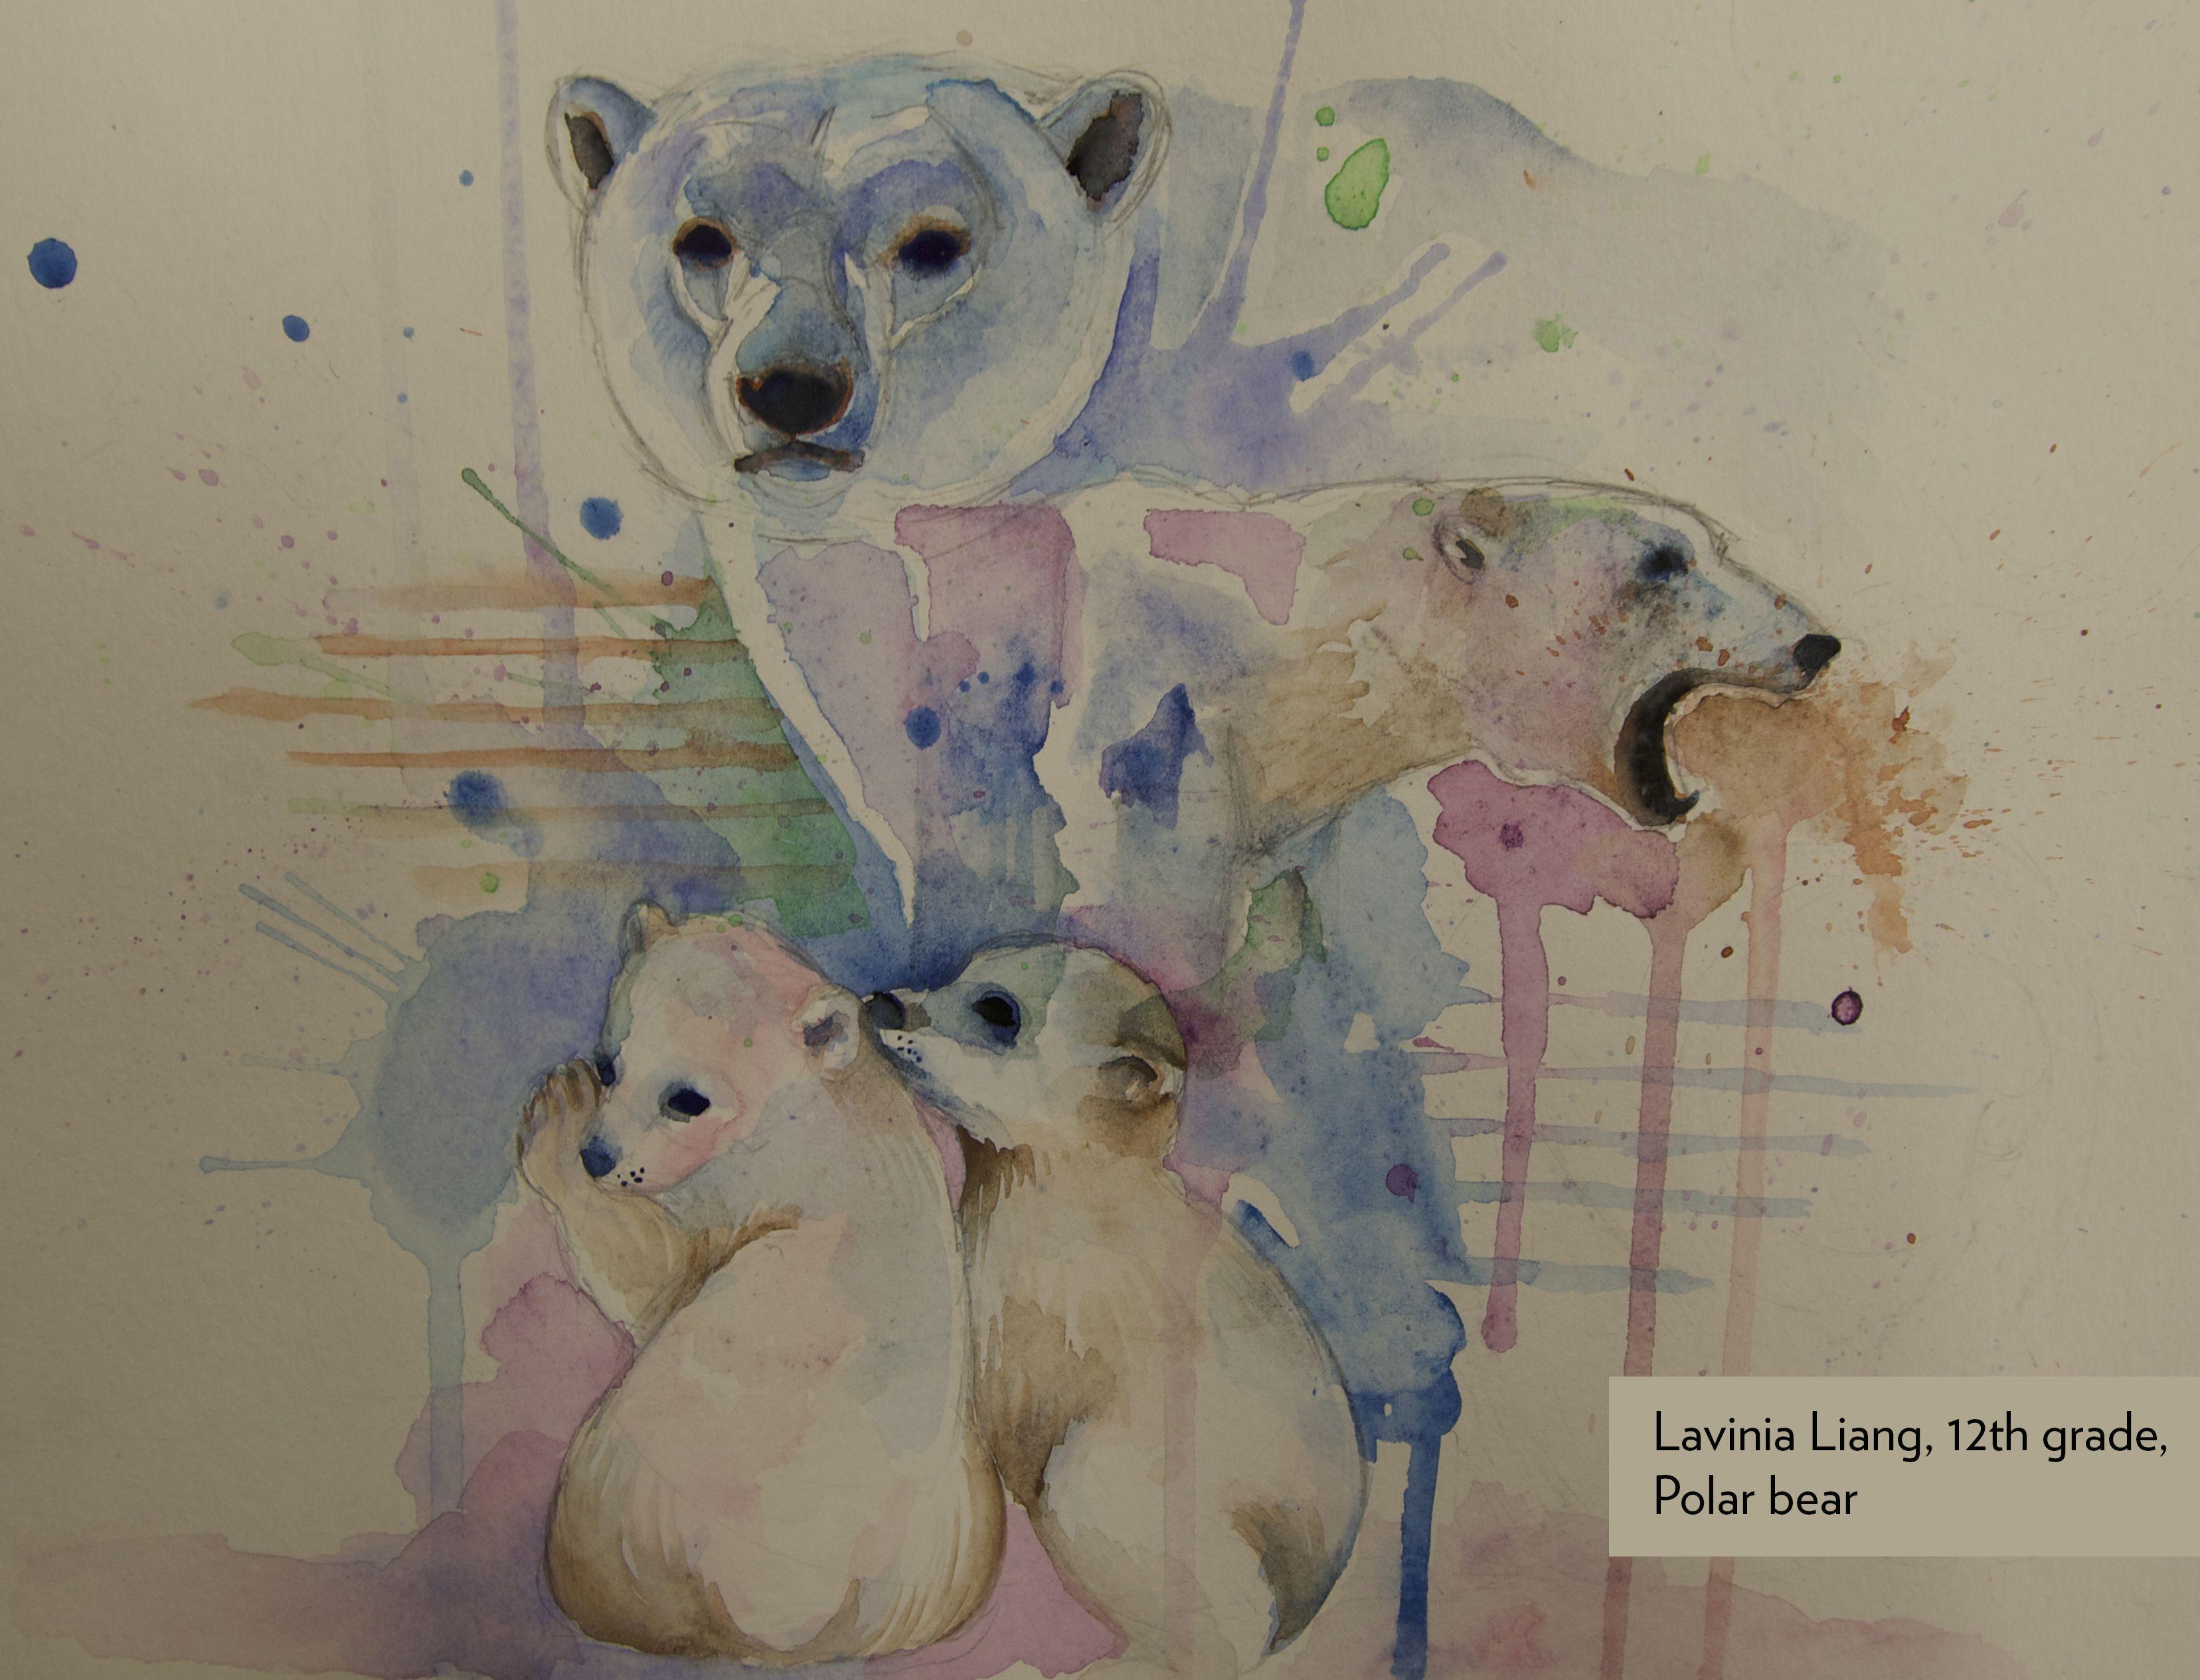 Art Contest Semifinalist, Grades 9-12: Polar bear, Lavinia Liang, Age 17, Spackenkill High School